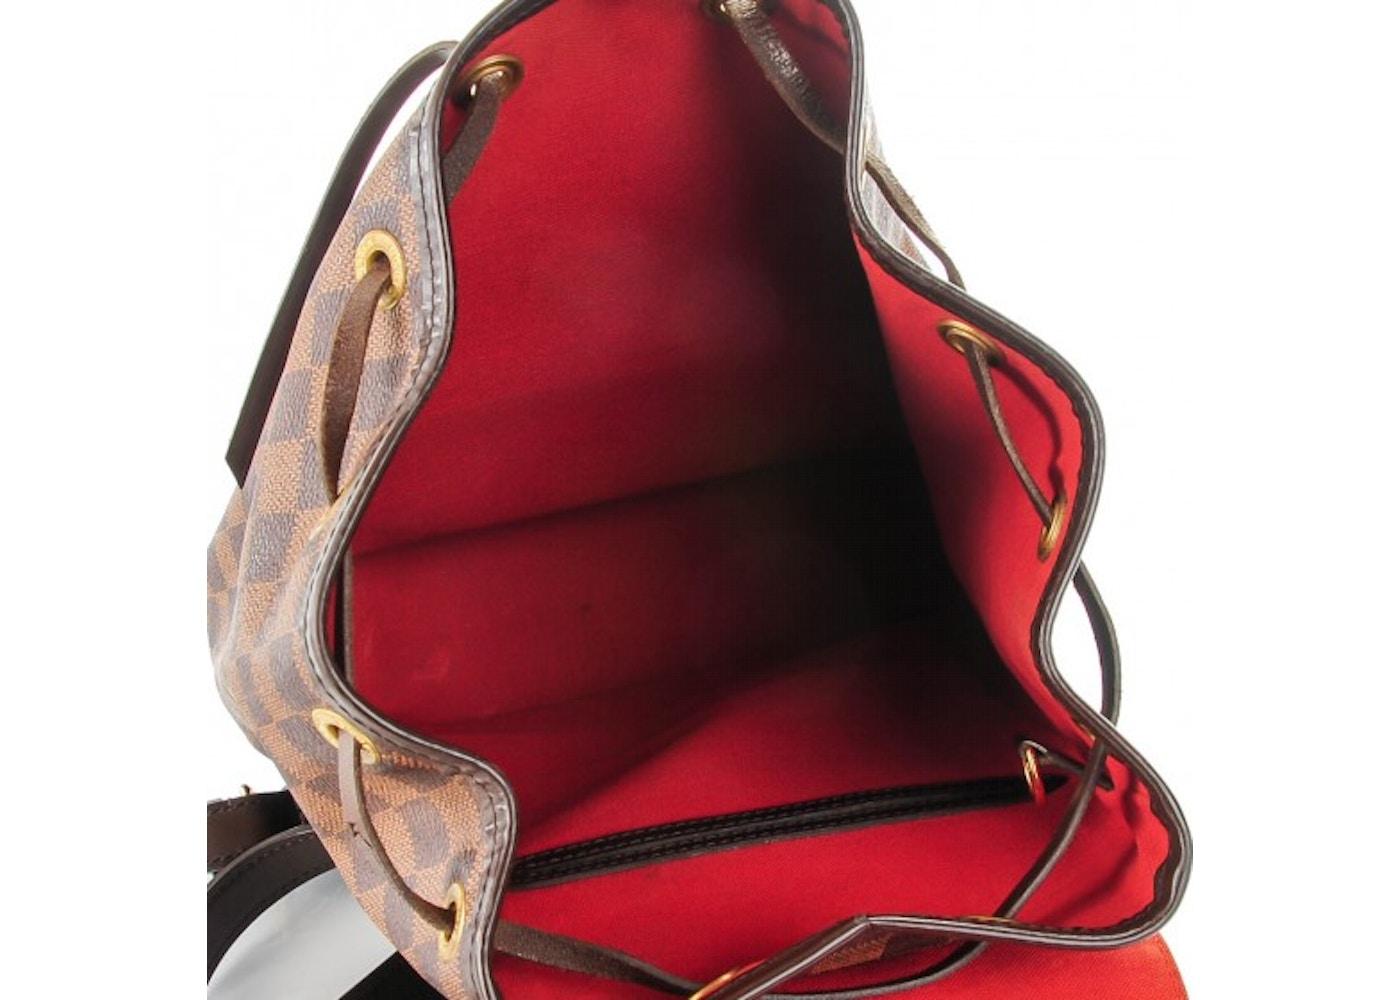 a20ee7743ce6 Louis Vuitton Montsouris Backpack Damier Ebene MM Brown